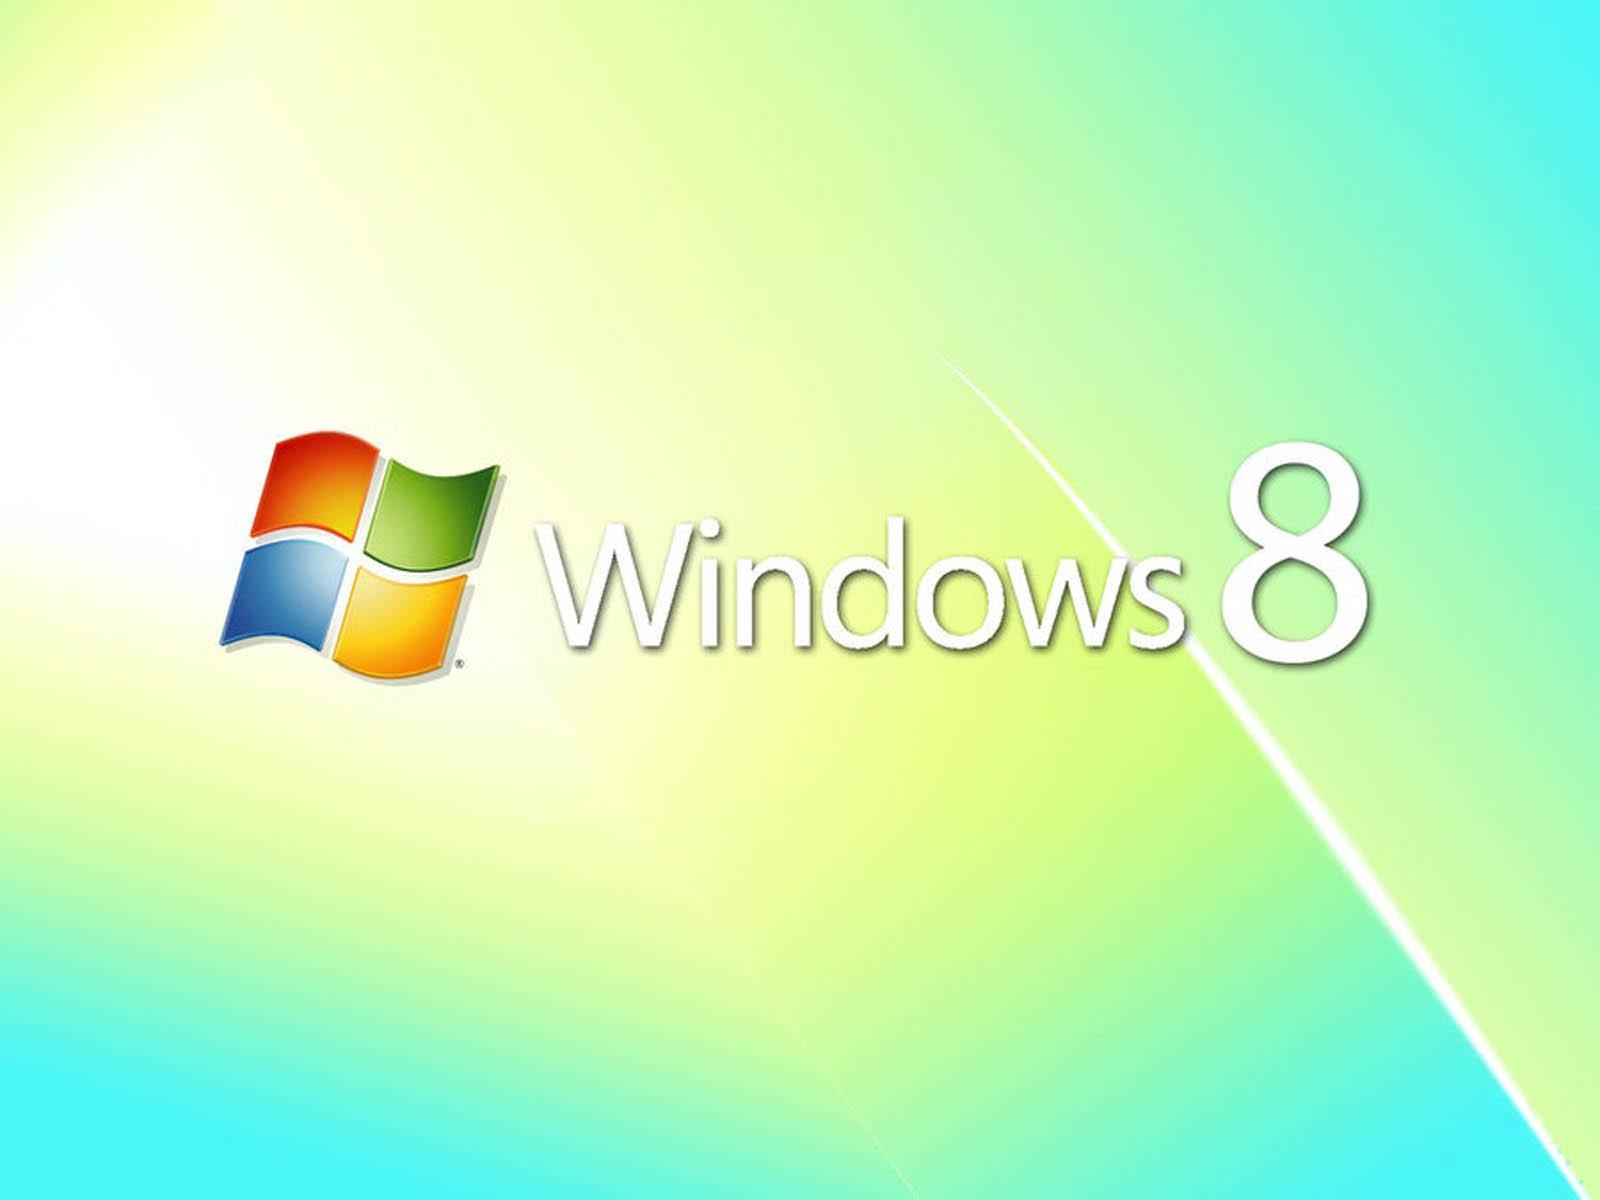 wallpaper: Windows 8 Backgrounds